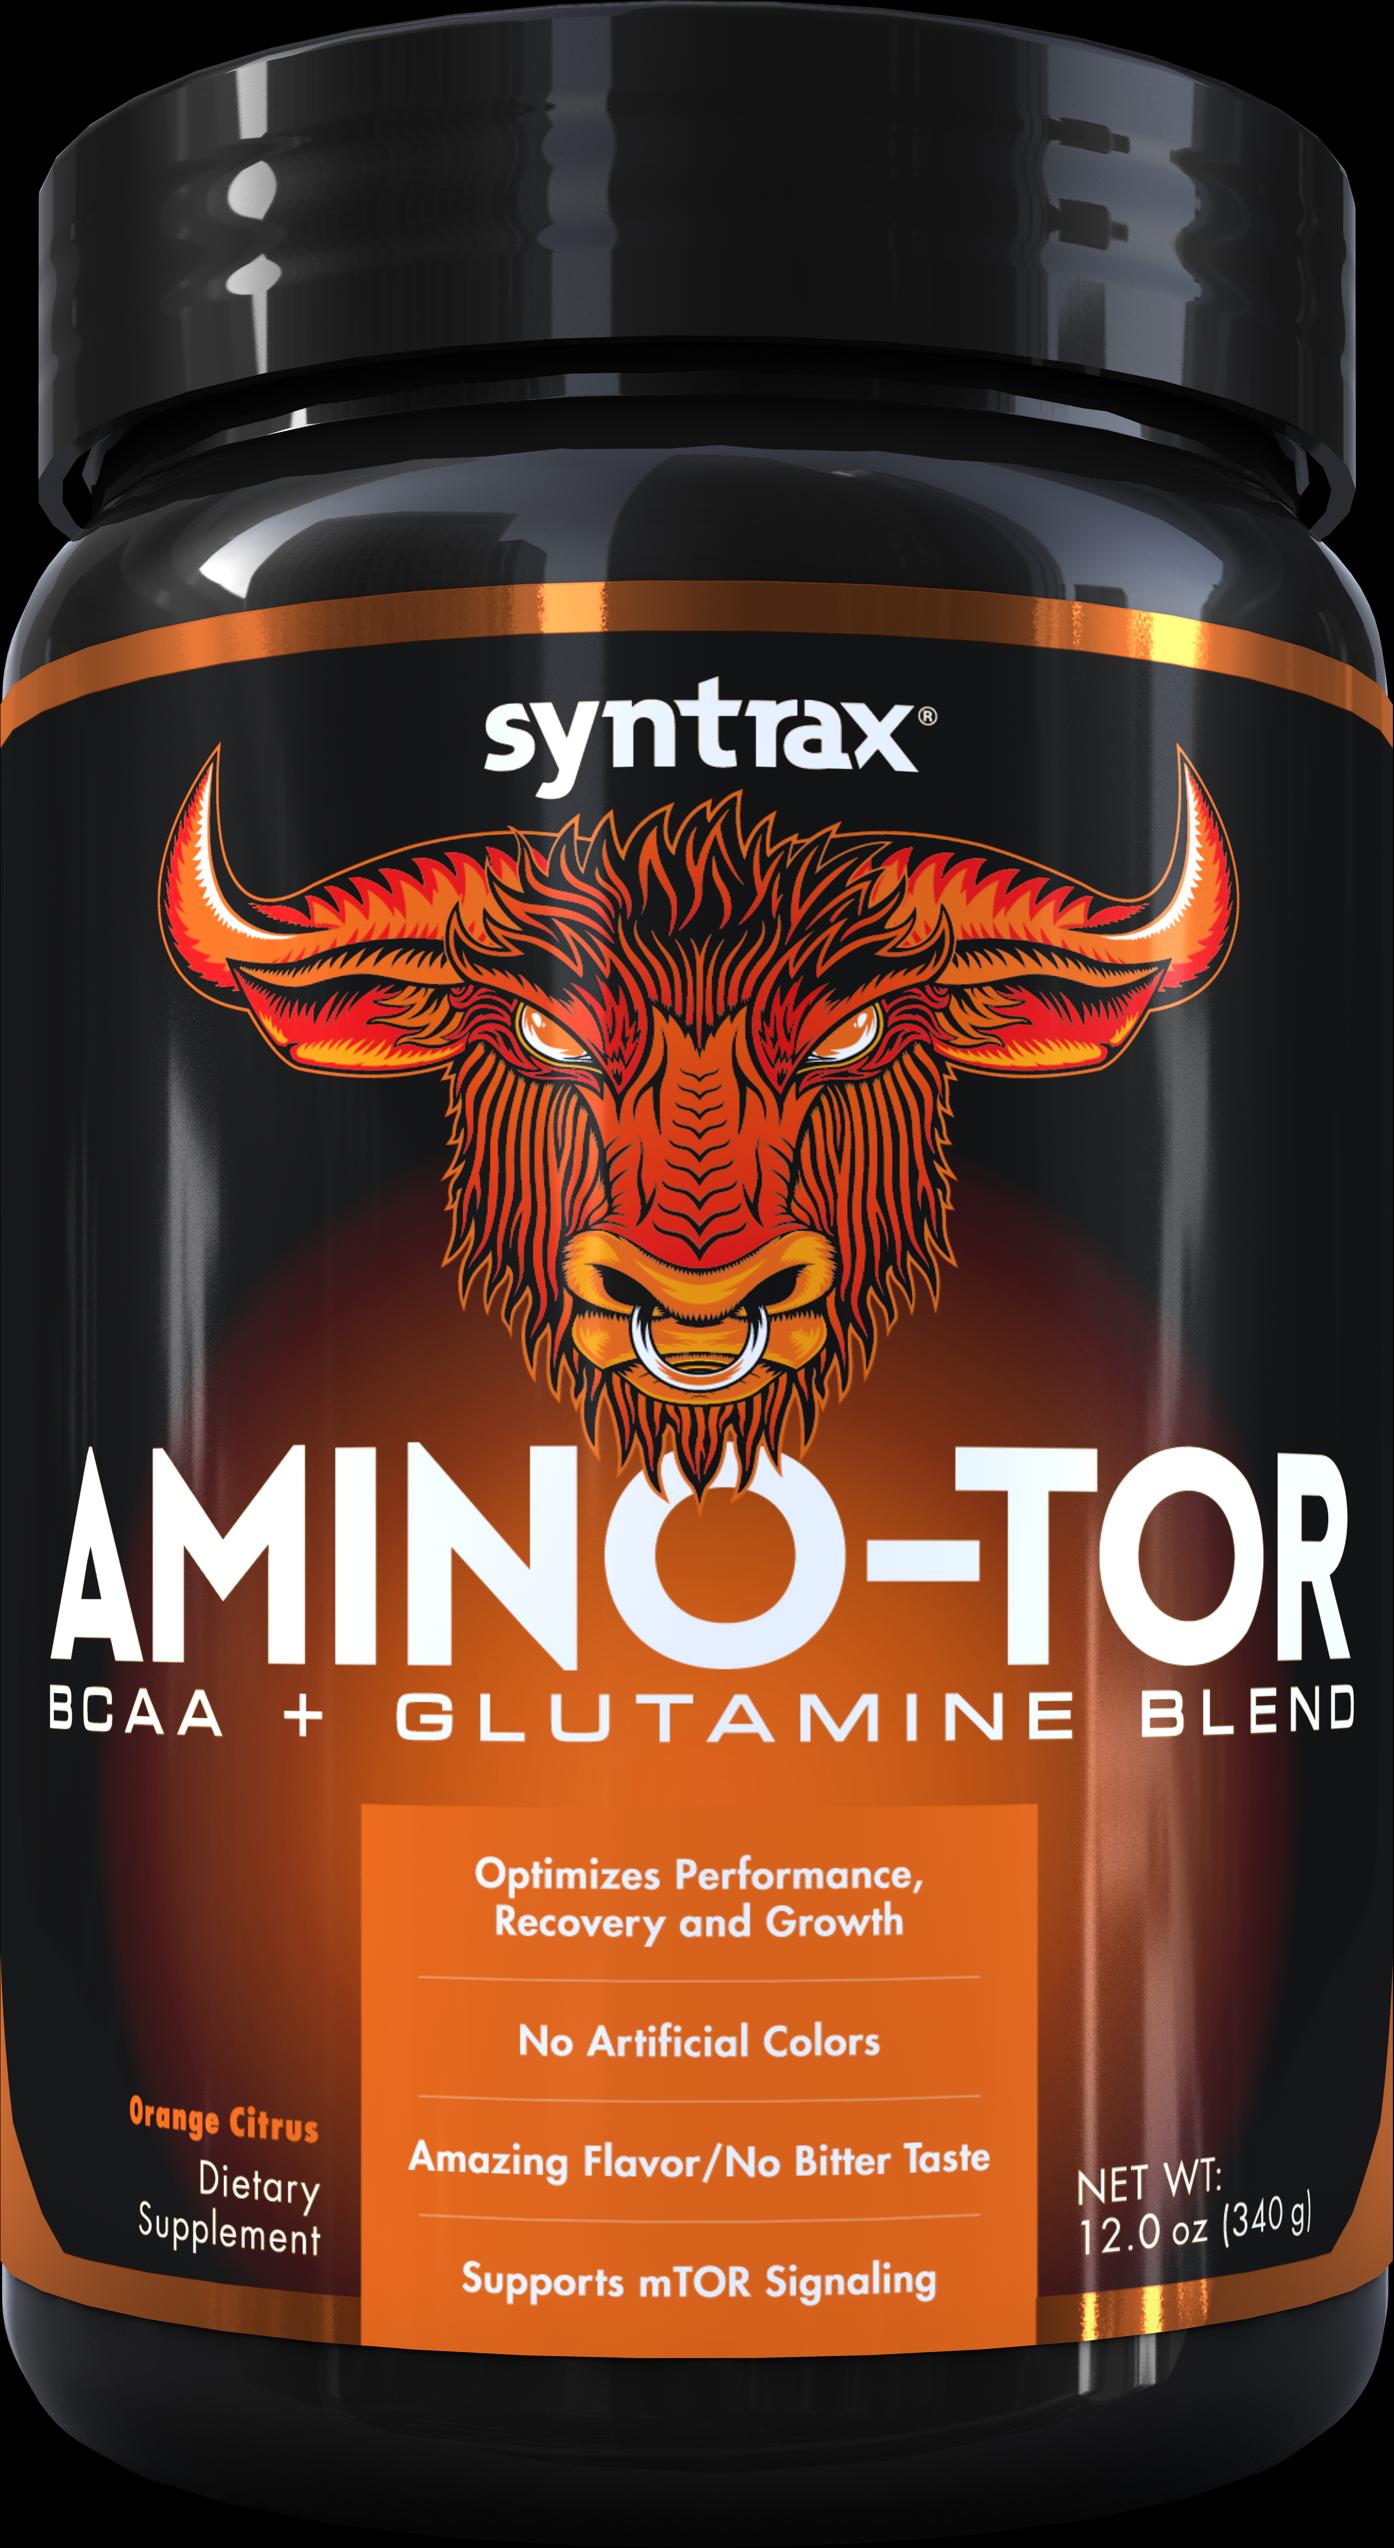 Syntrax Amino-tor - Orange Citrus340 g